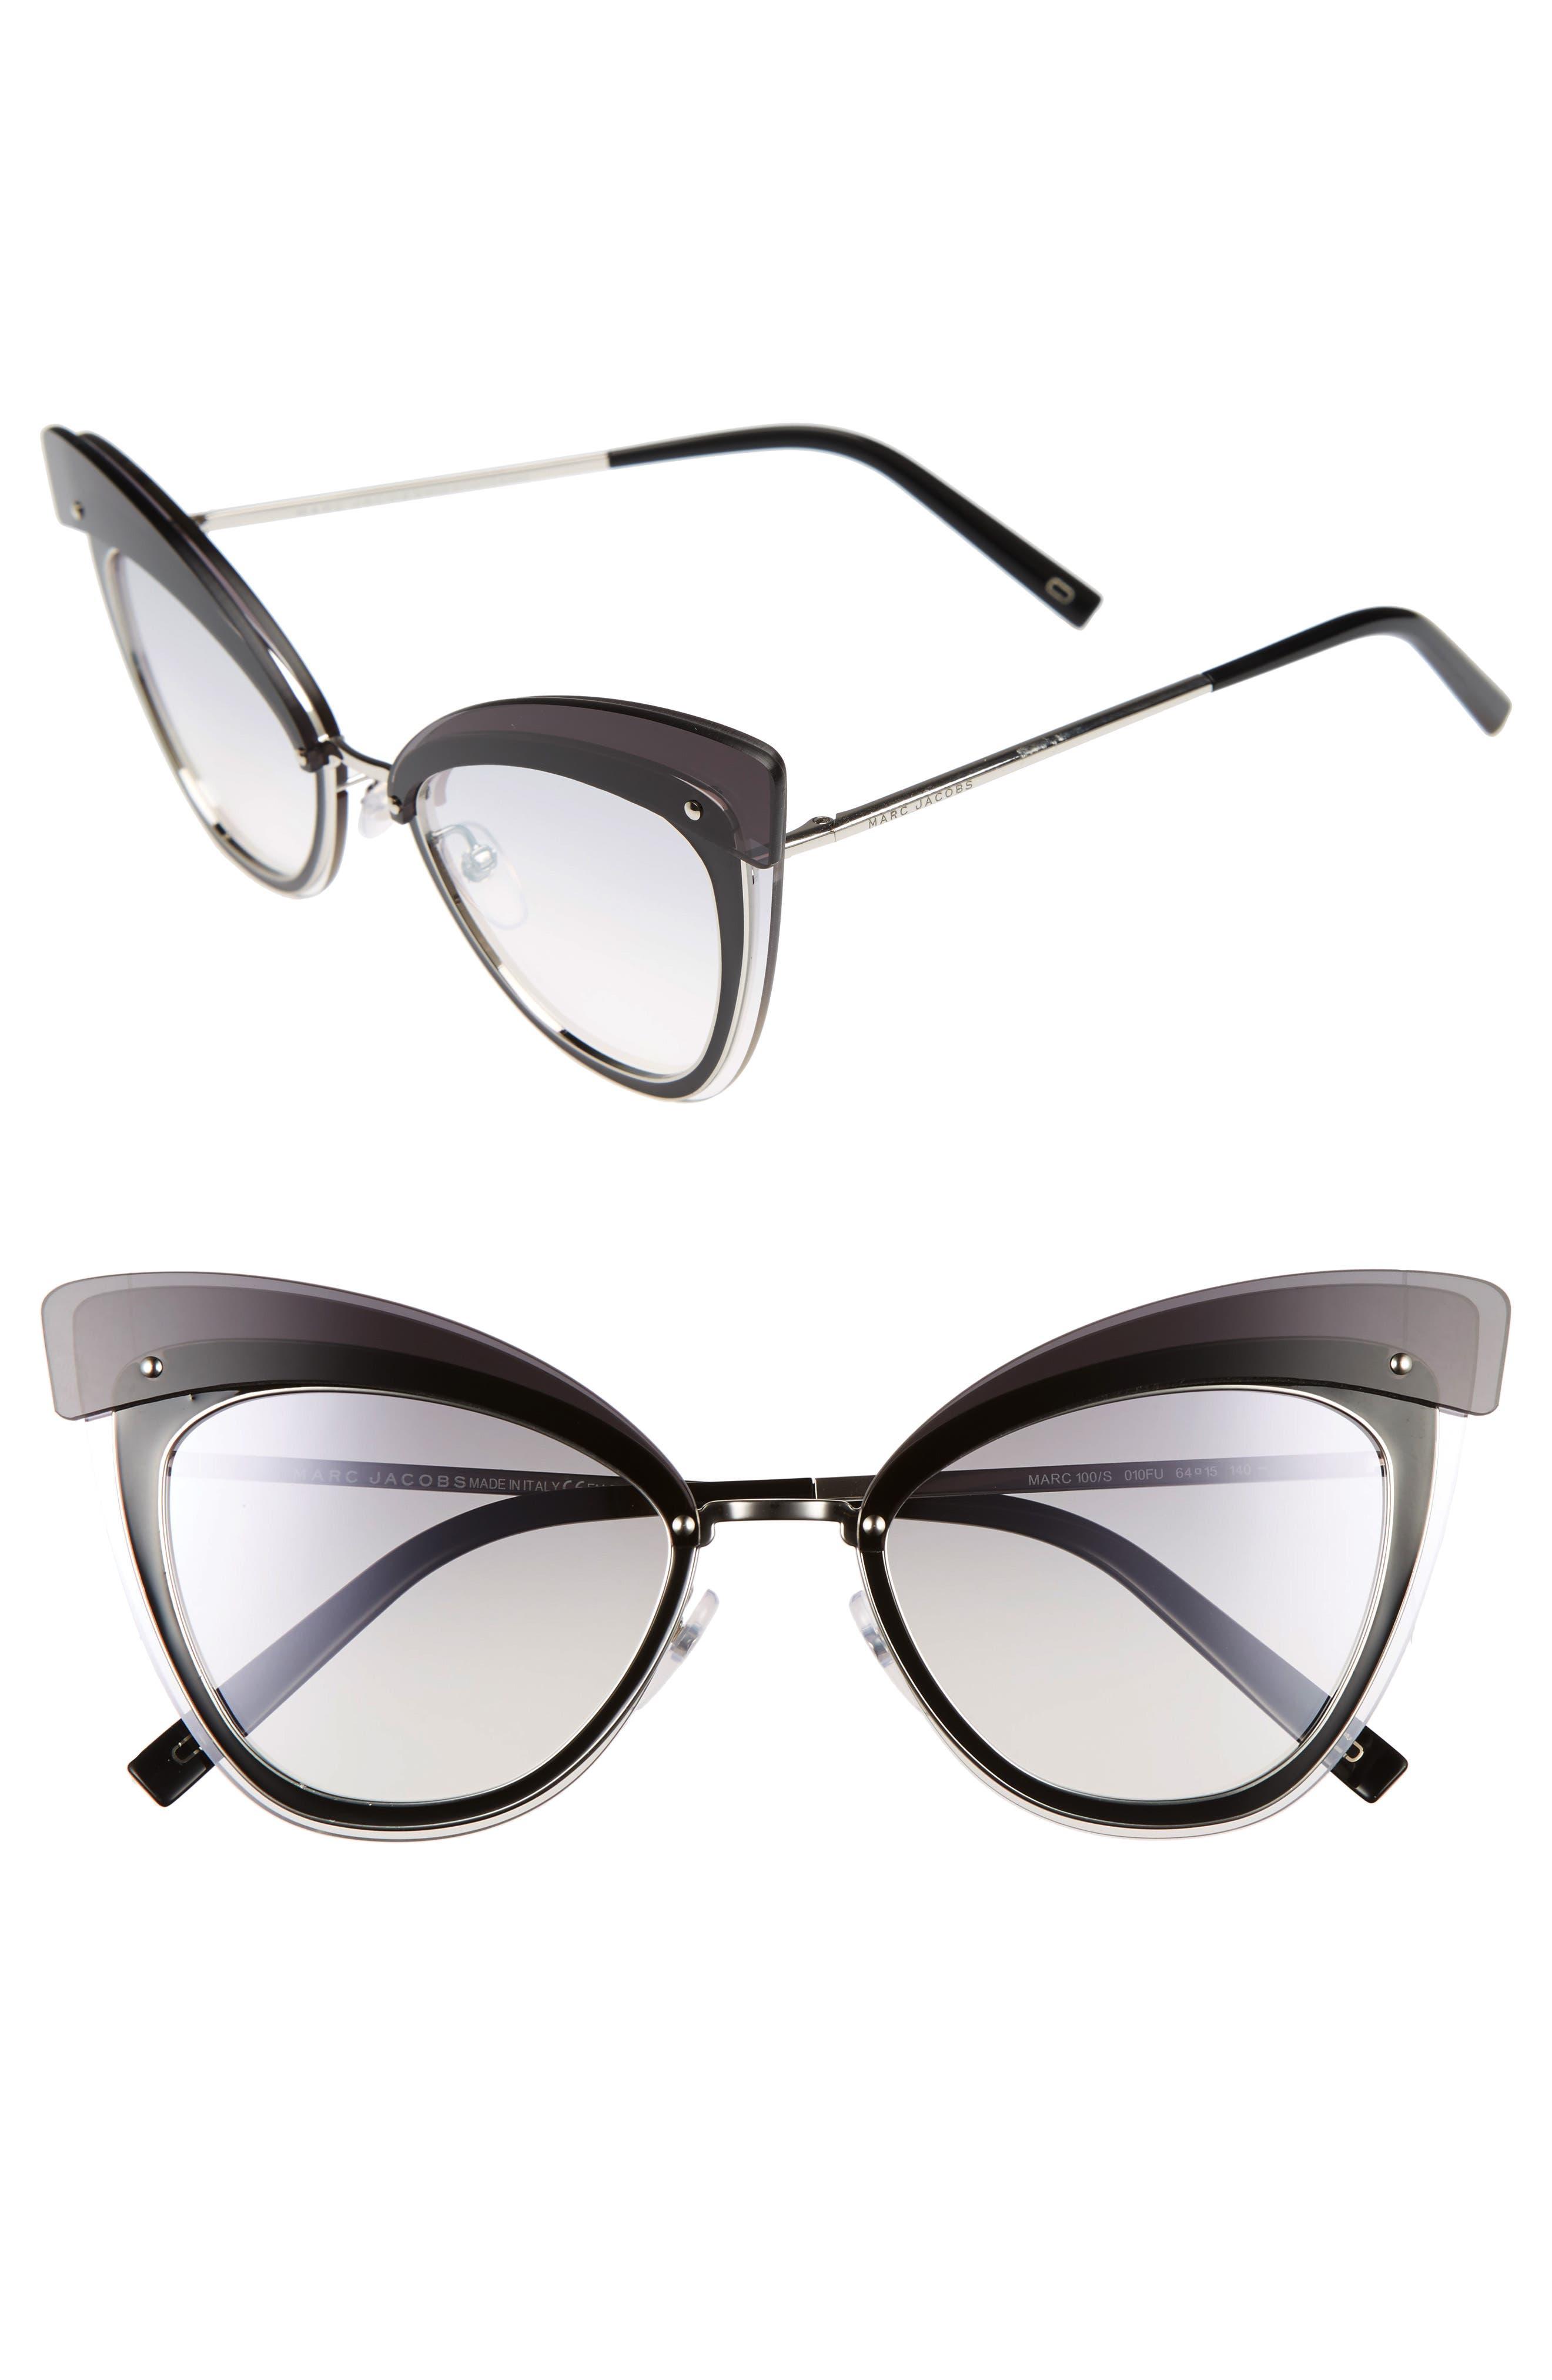 64mm Sunglasses,                             Main thumbnail 1, color,                             041